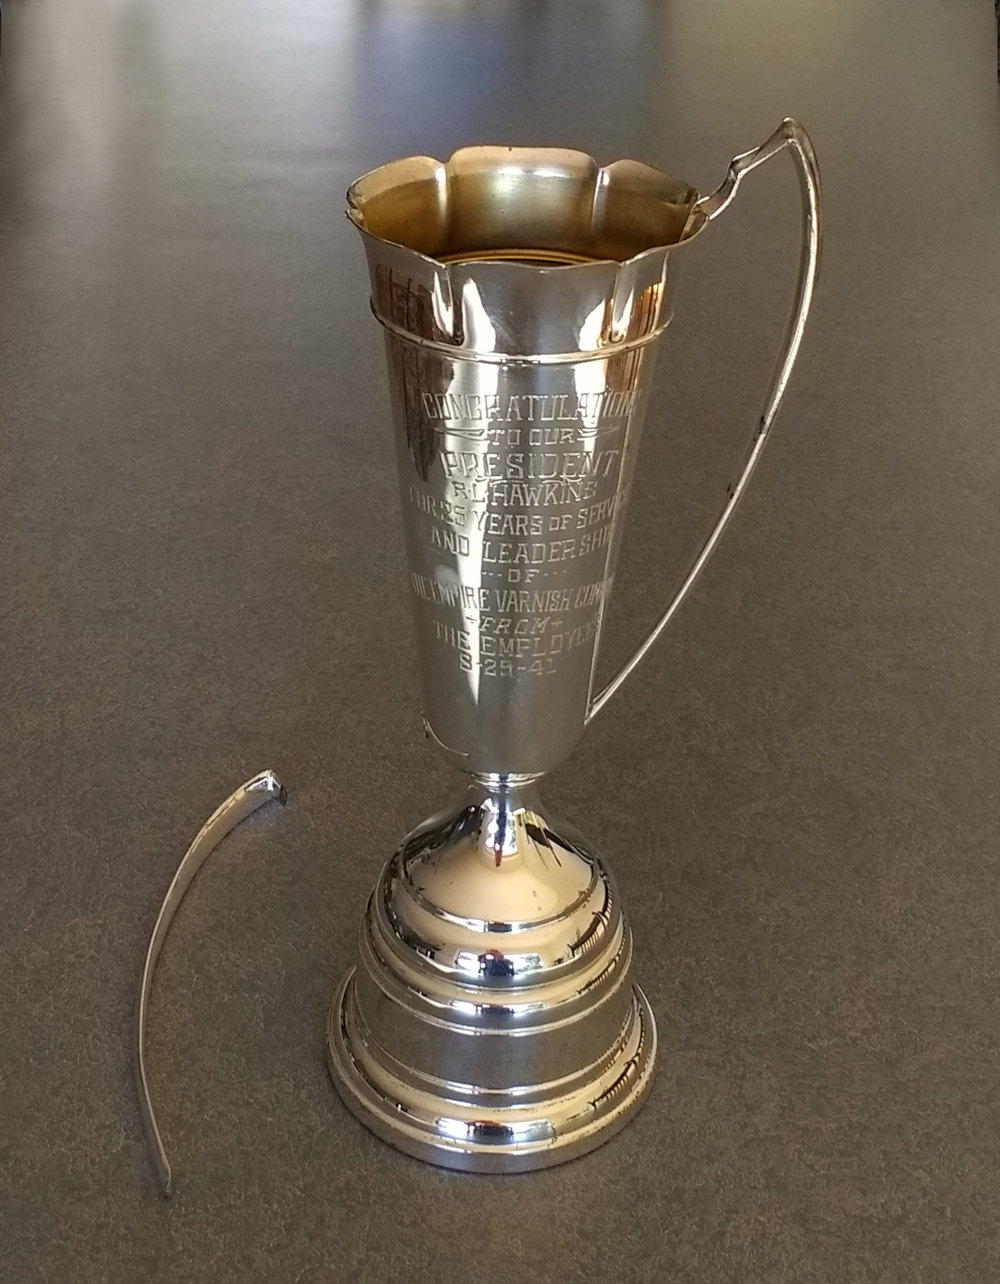 Vintage trophy after removing laequer